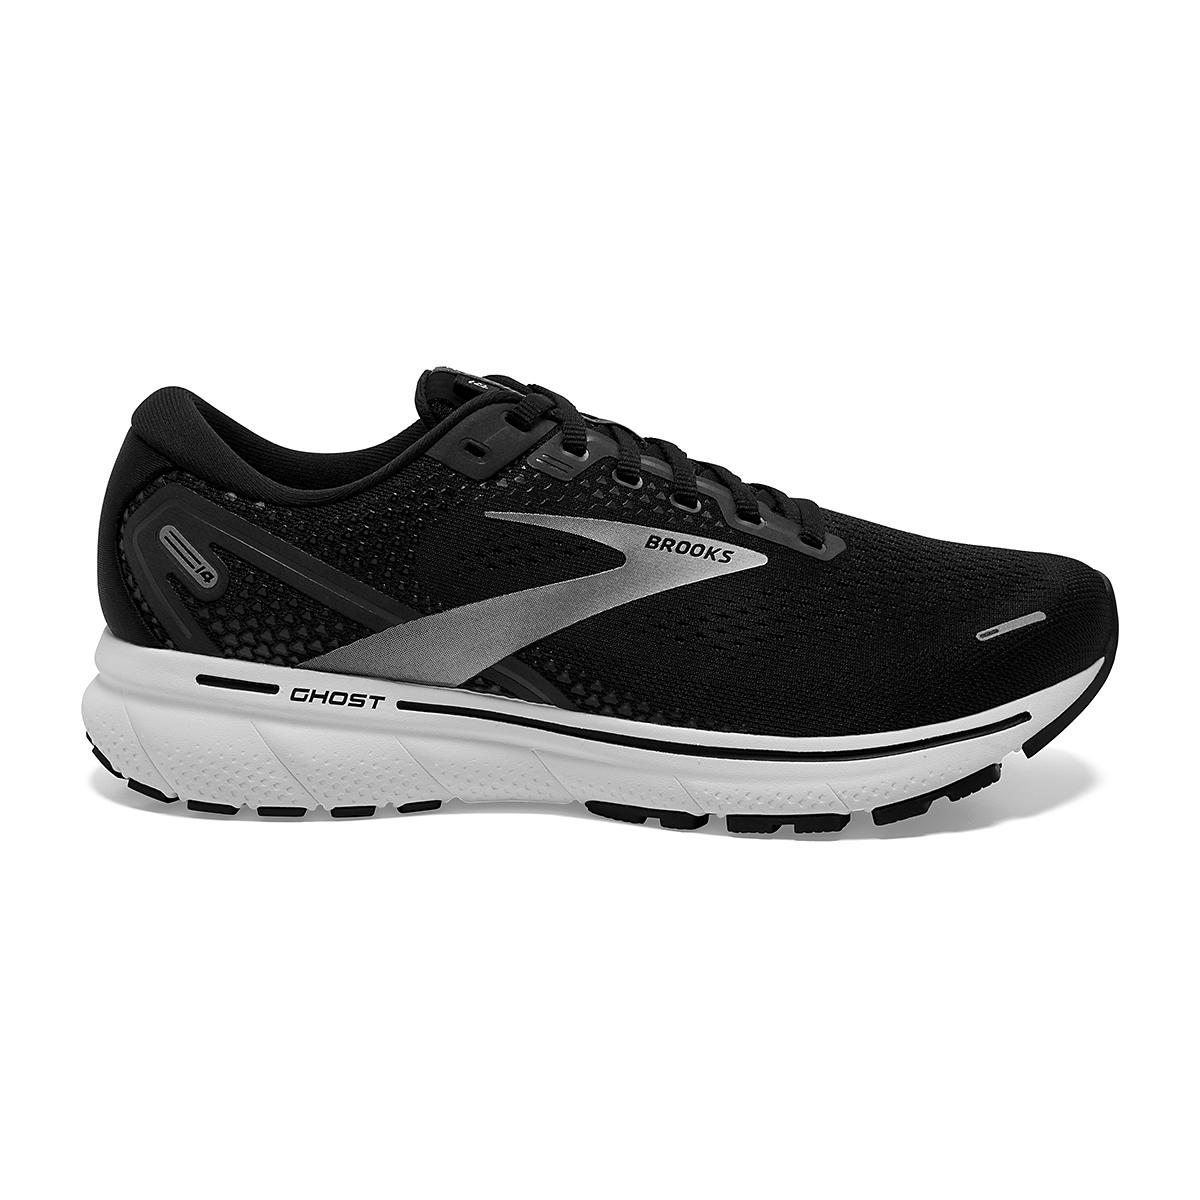 Men's Brooks Ghost 14 Running Shoe - Color: Black/White - Size: 7 - Width: Regular, Black/White, large, image 1